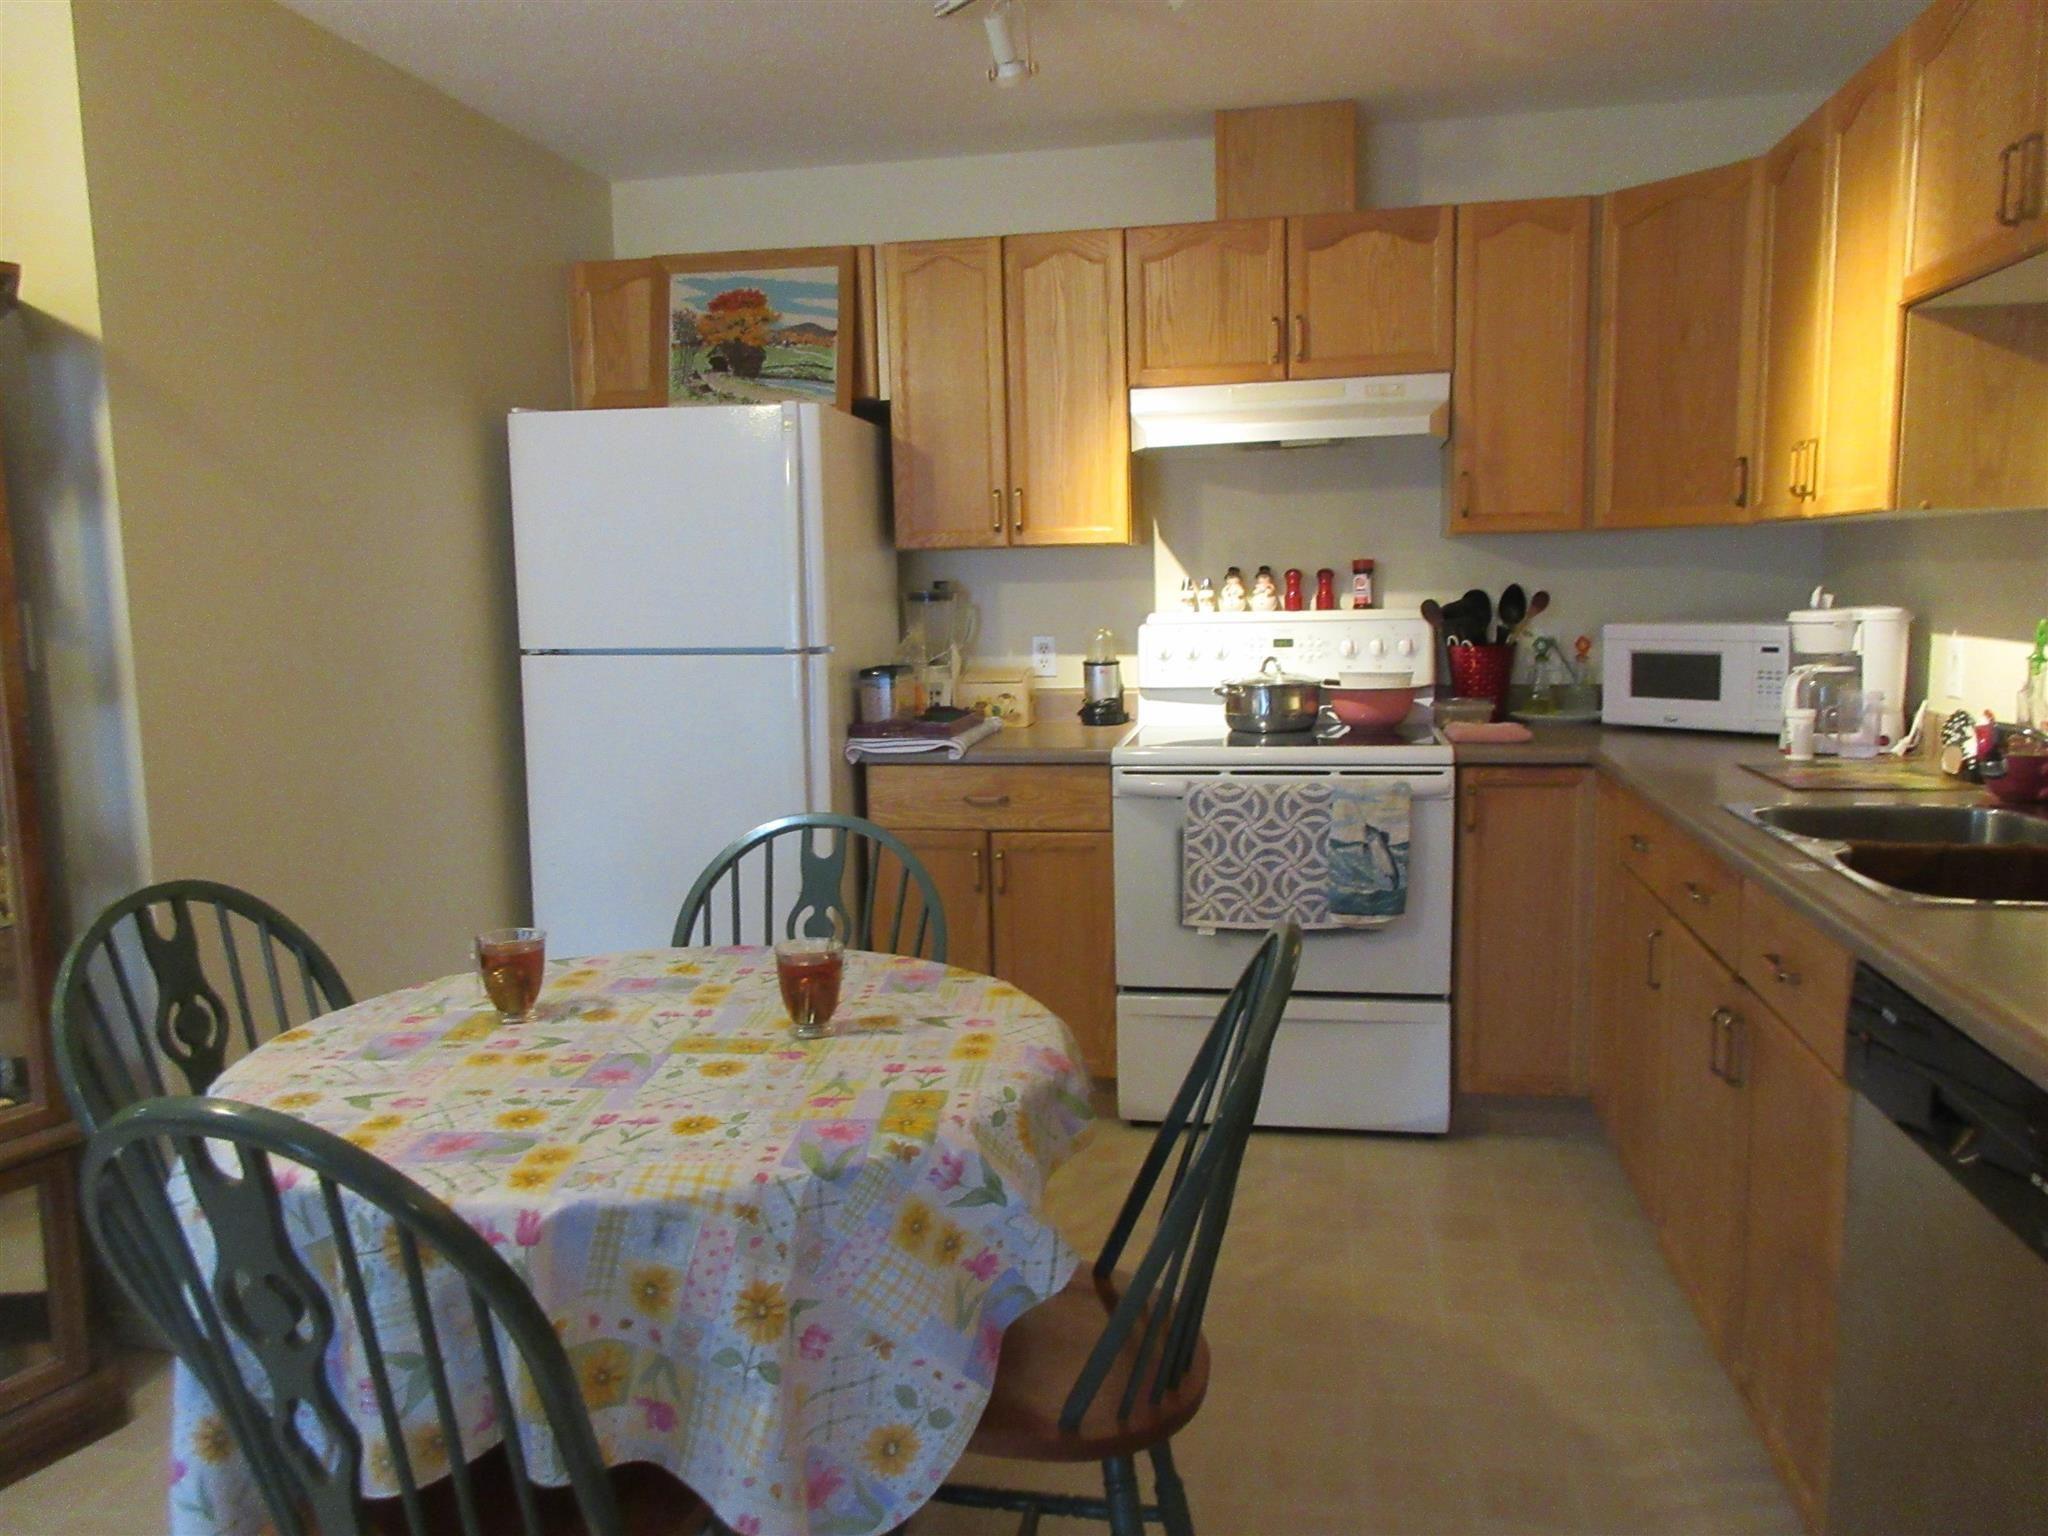 Main Photo: 203 4703 43 Avenue: Stony Plain Condo for sale : MLS®# E4256465